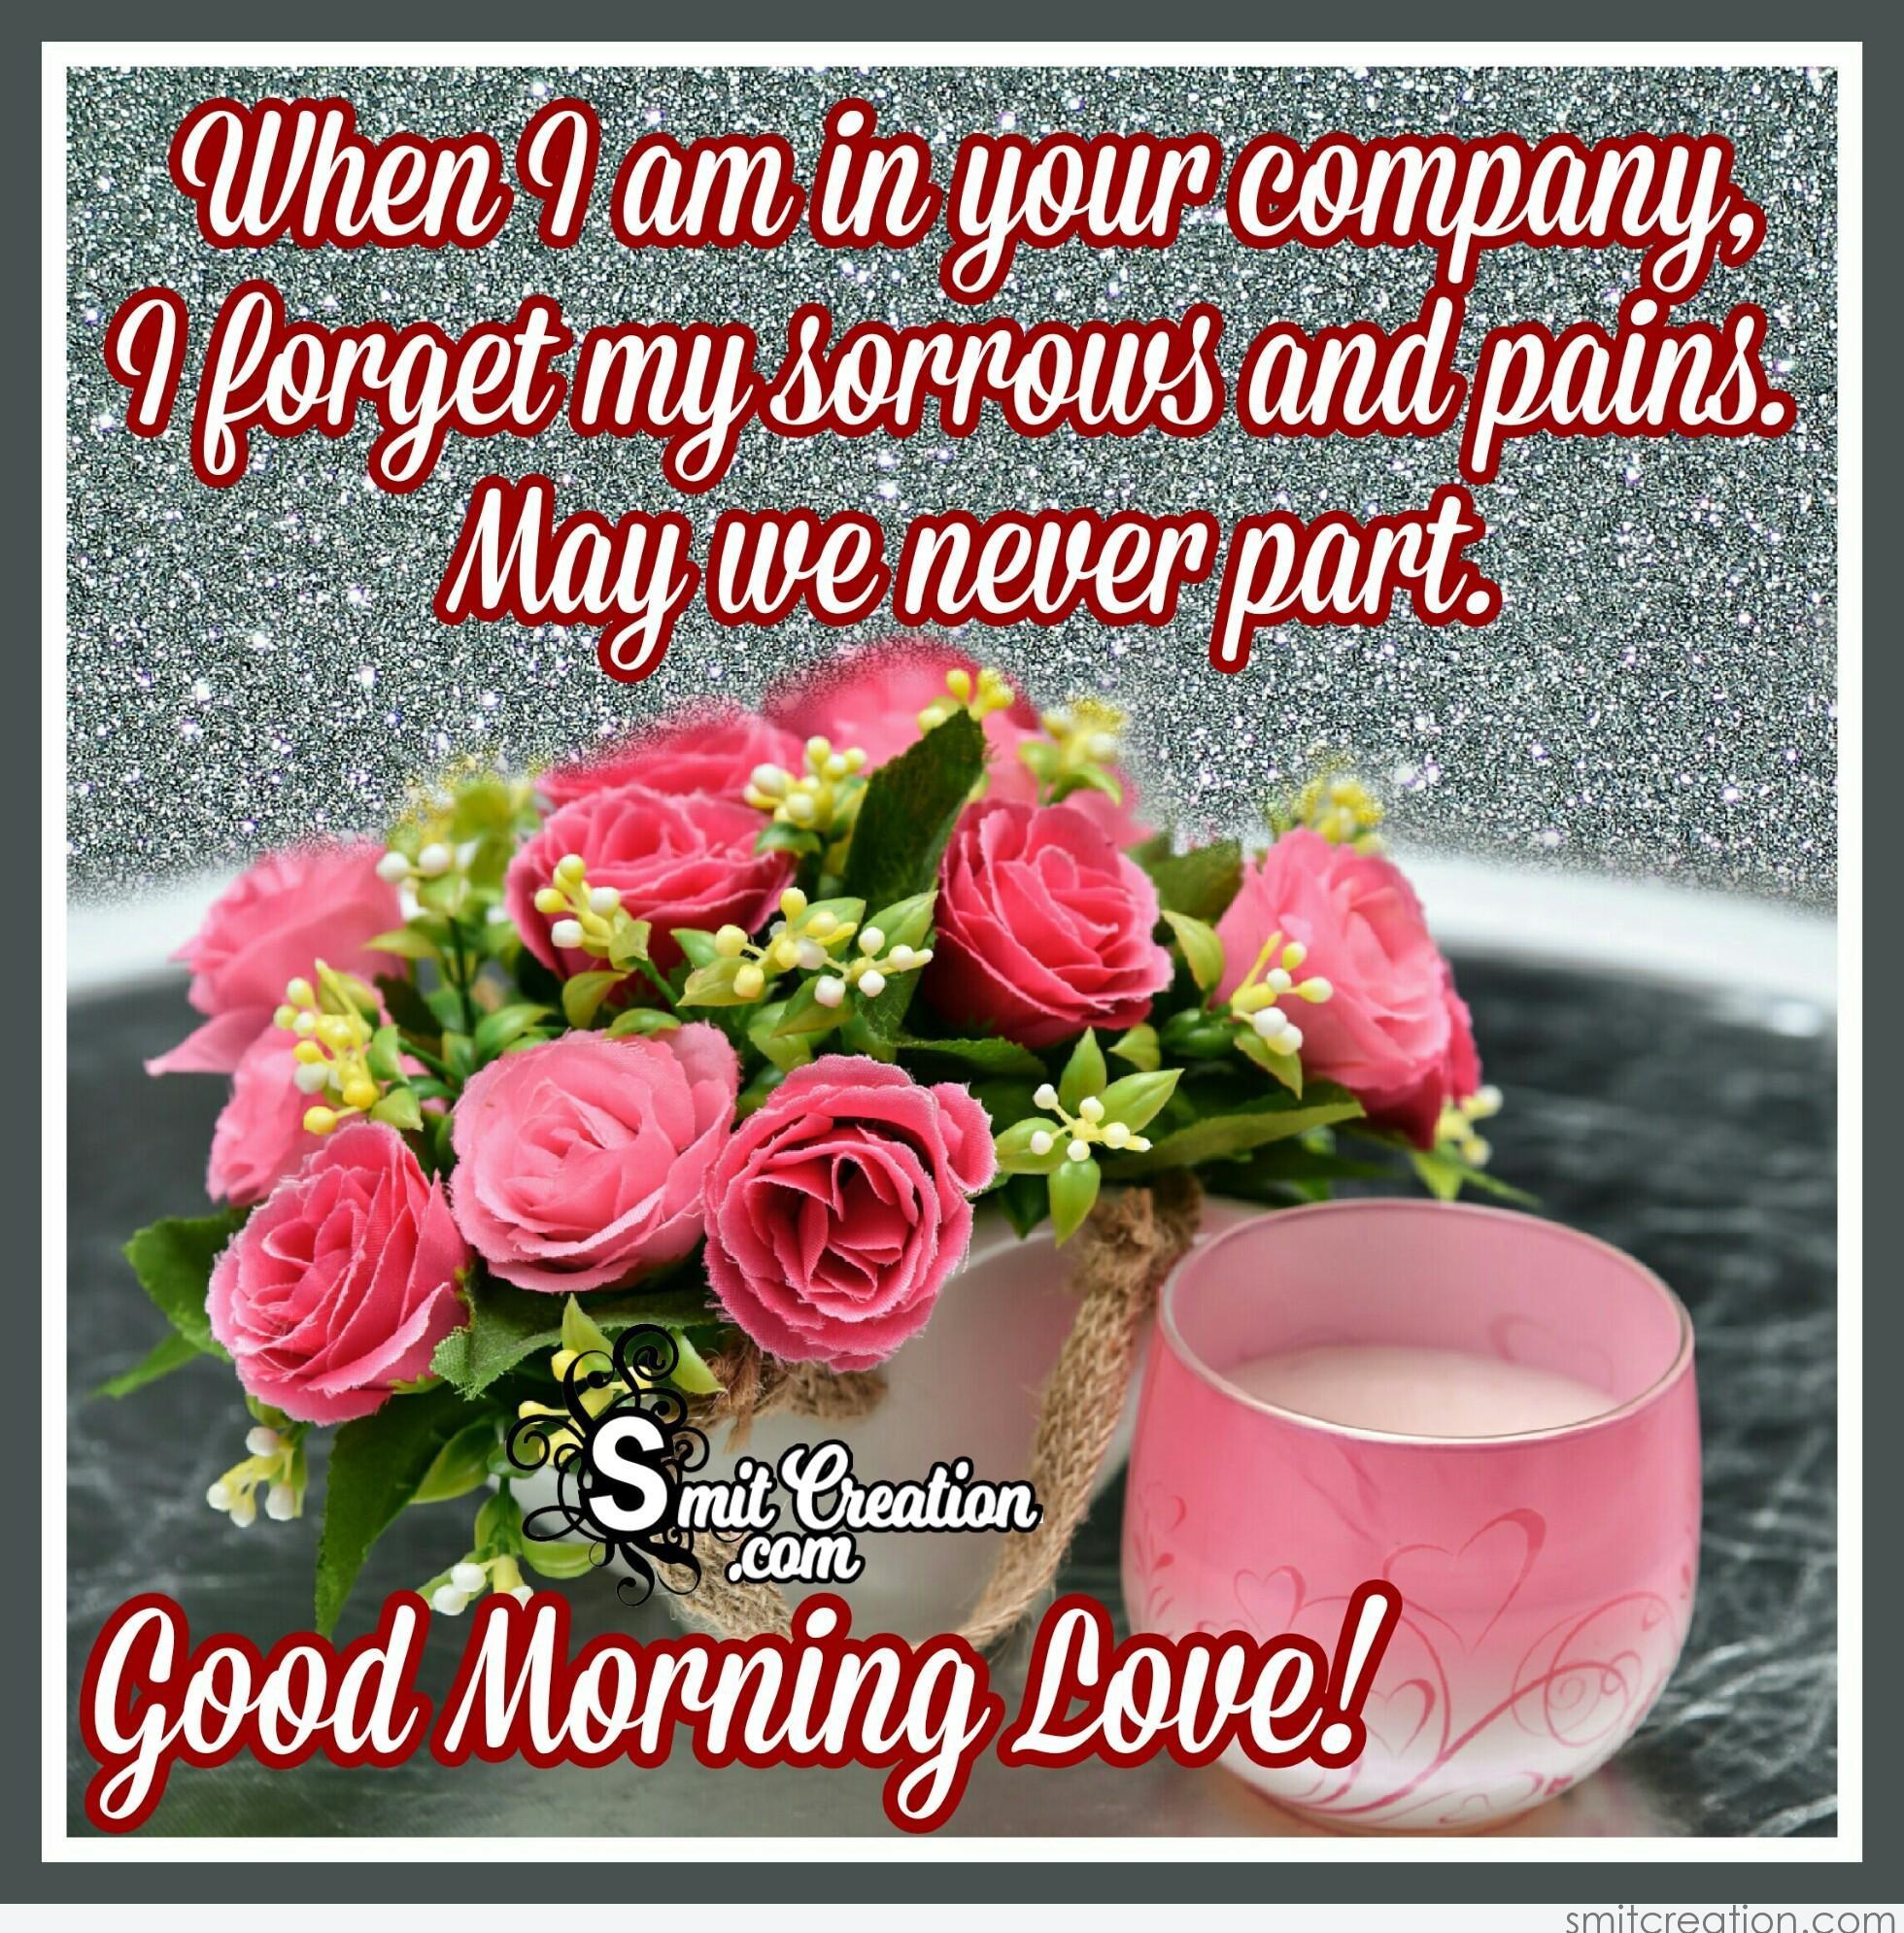 Good Morning Love Smitcreation